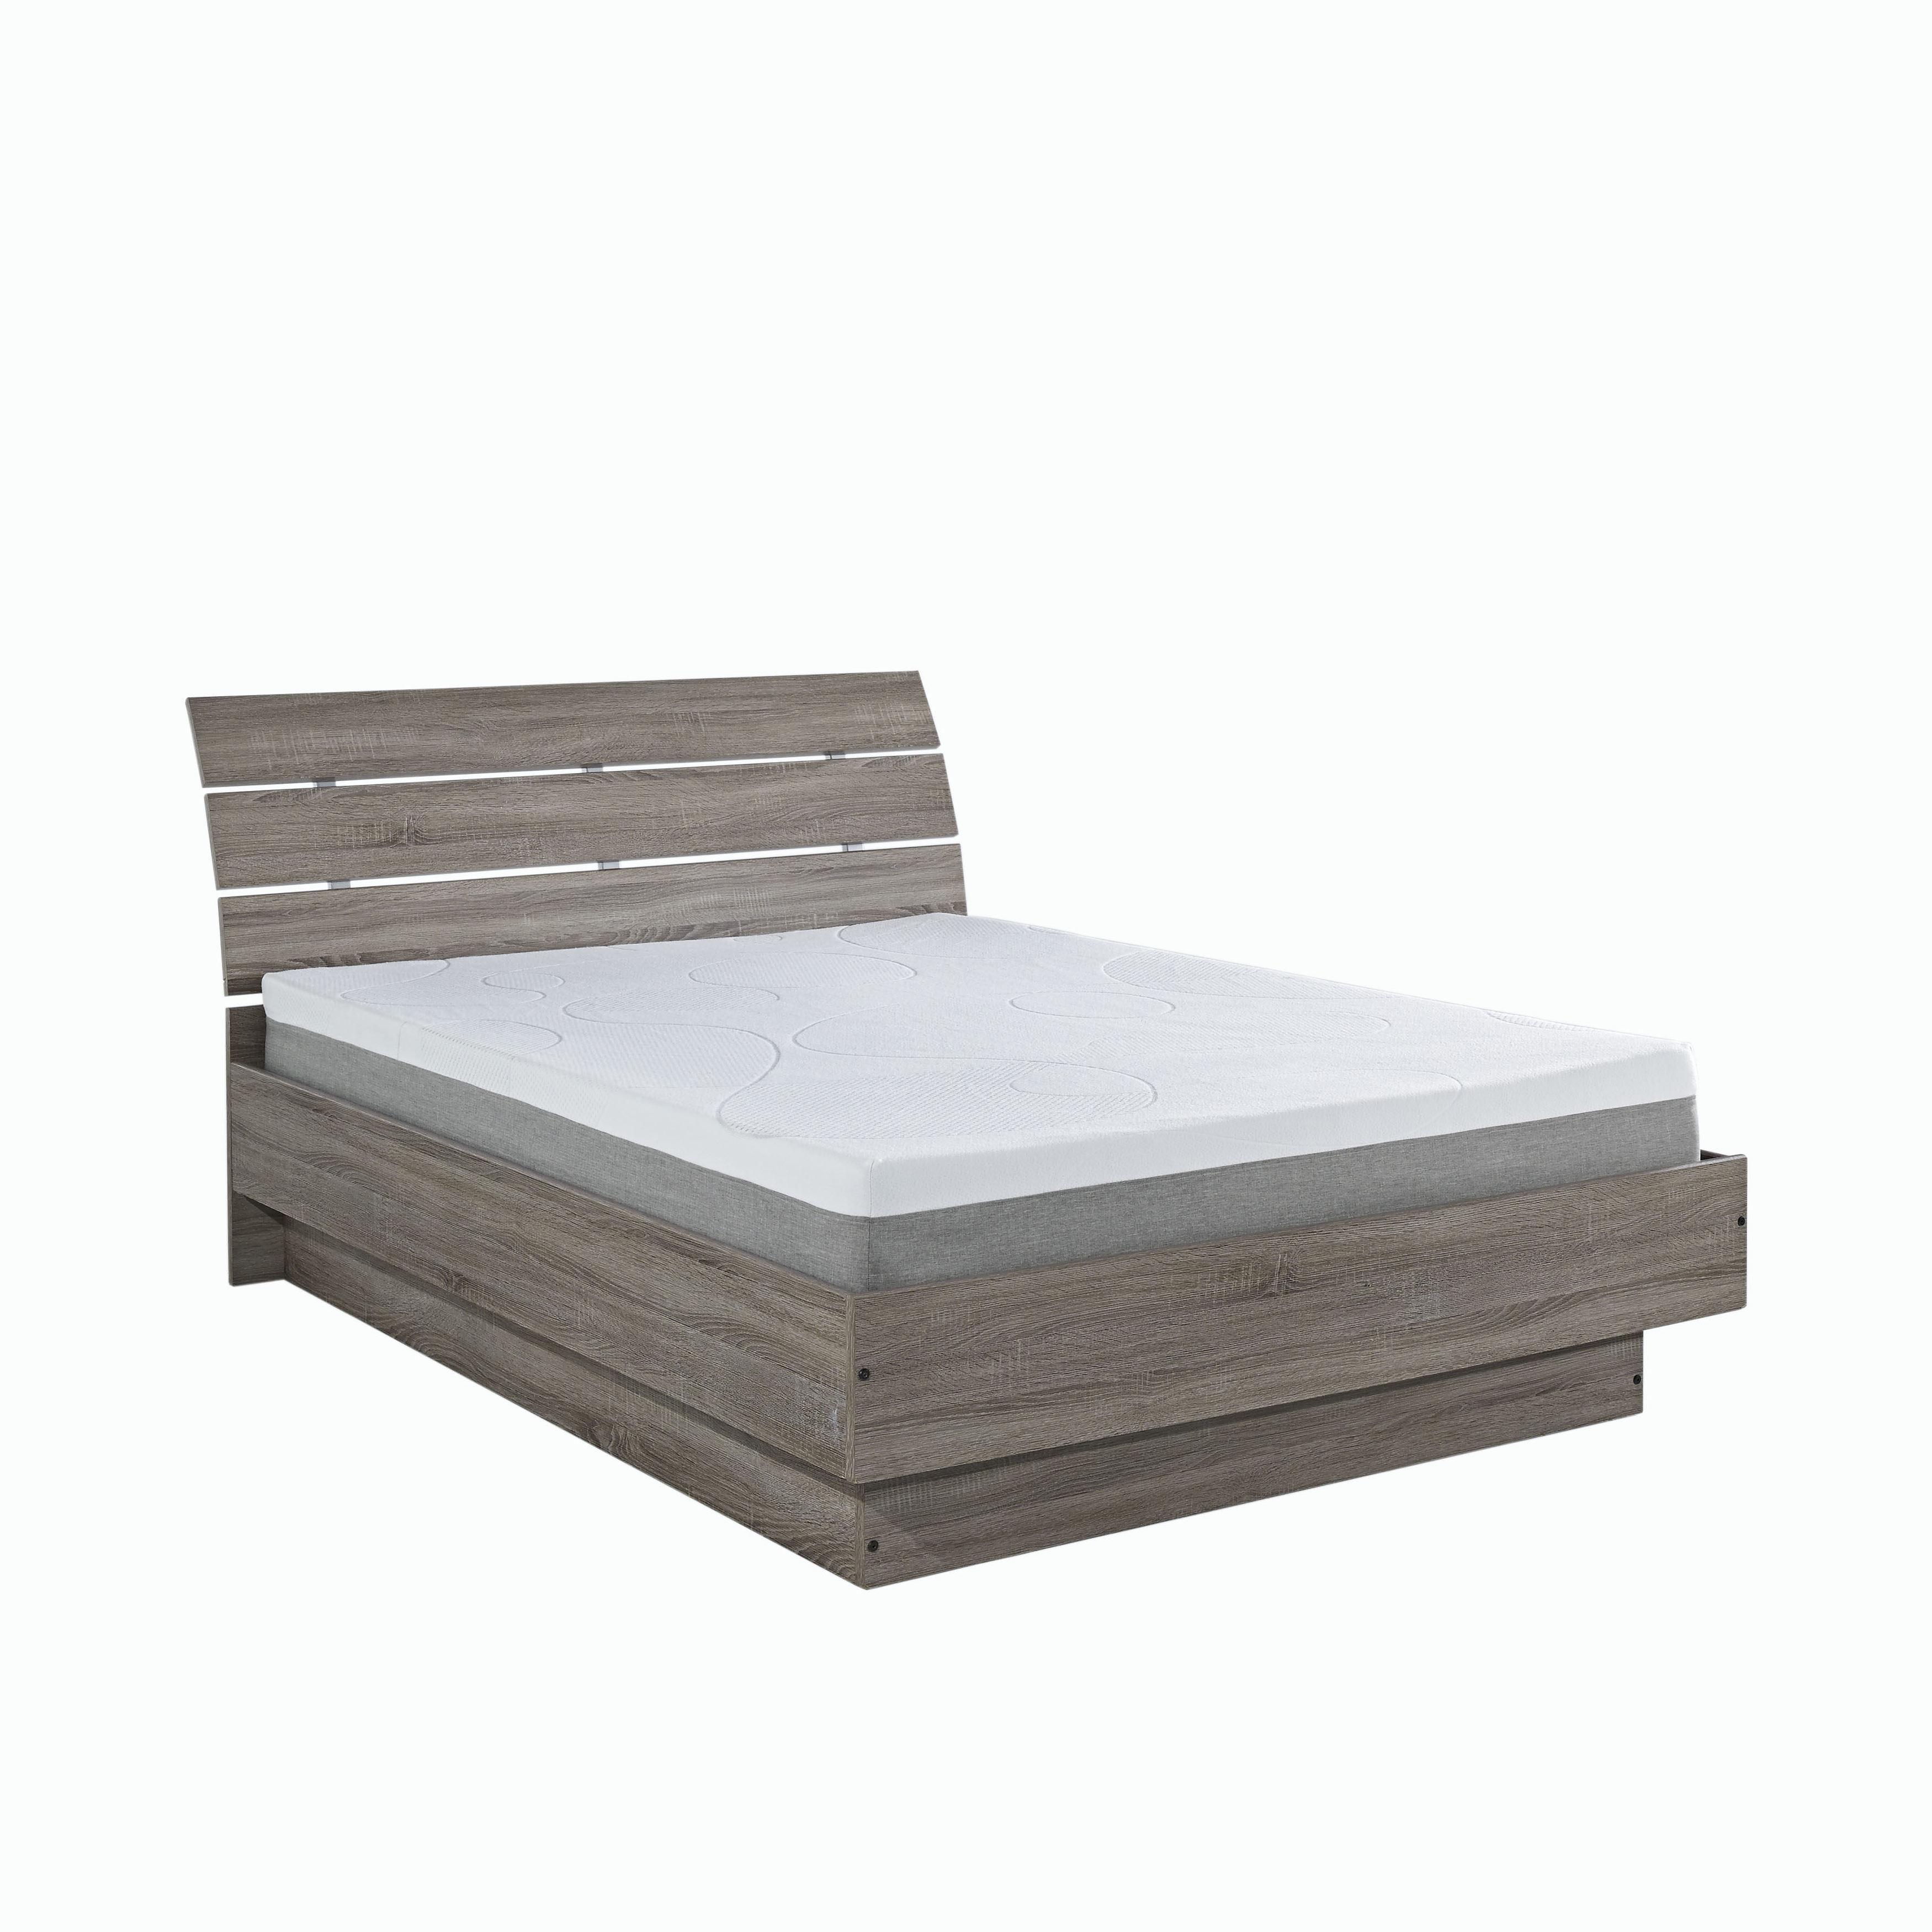 full mattress size. Slumber Solutions Choose Your Comfort 12-inch Full-size Gel Memory Foam Mattress + Bonus Pad - Free Shipping Today Overstock 15869716 Full Size